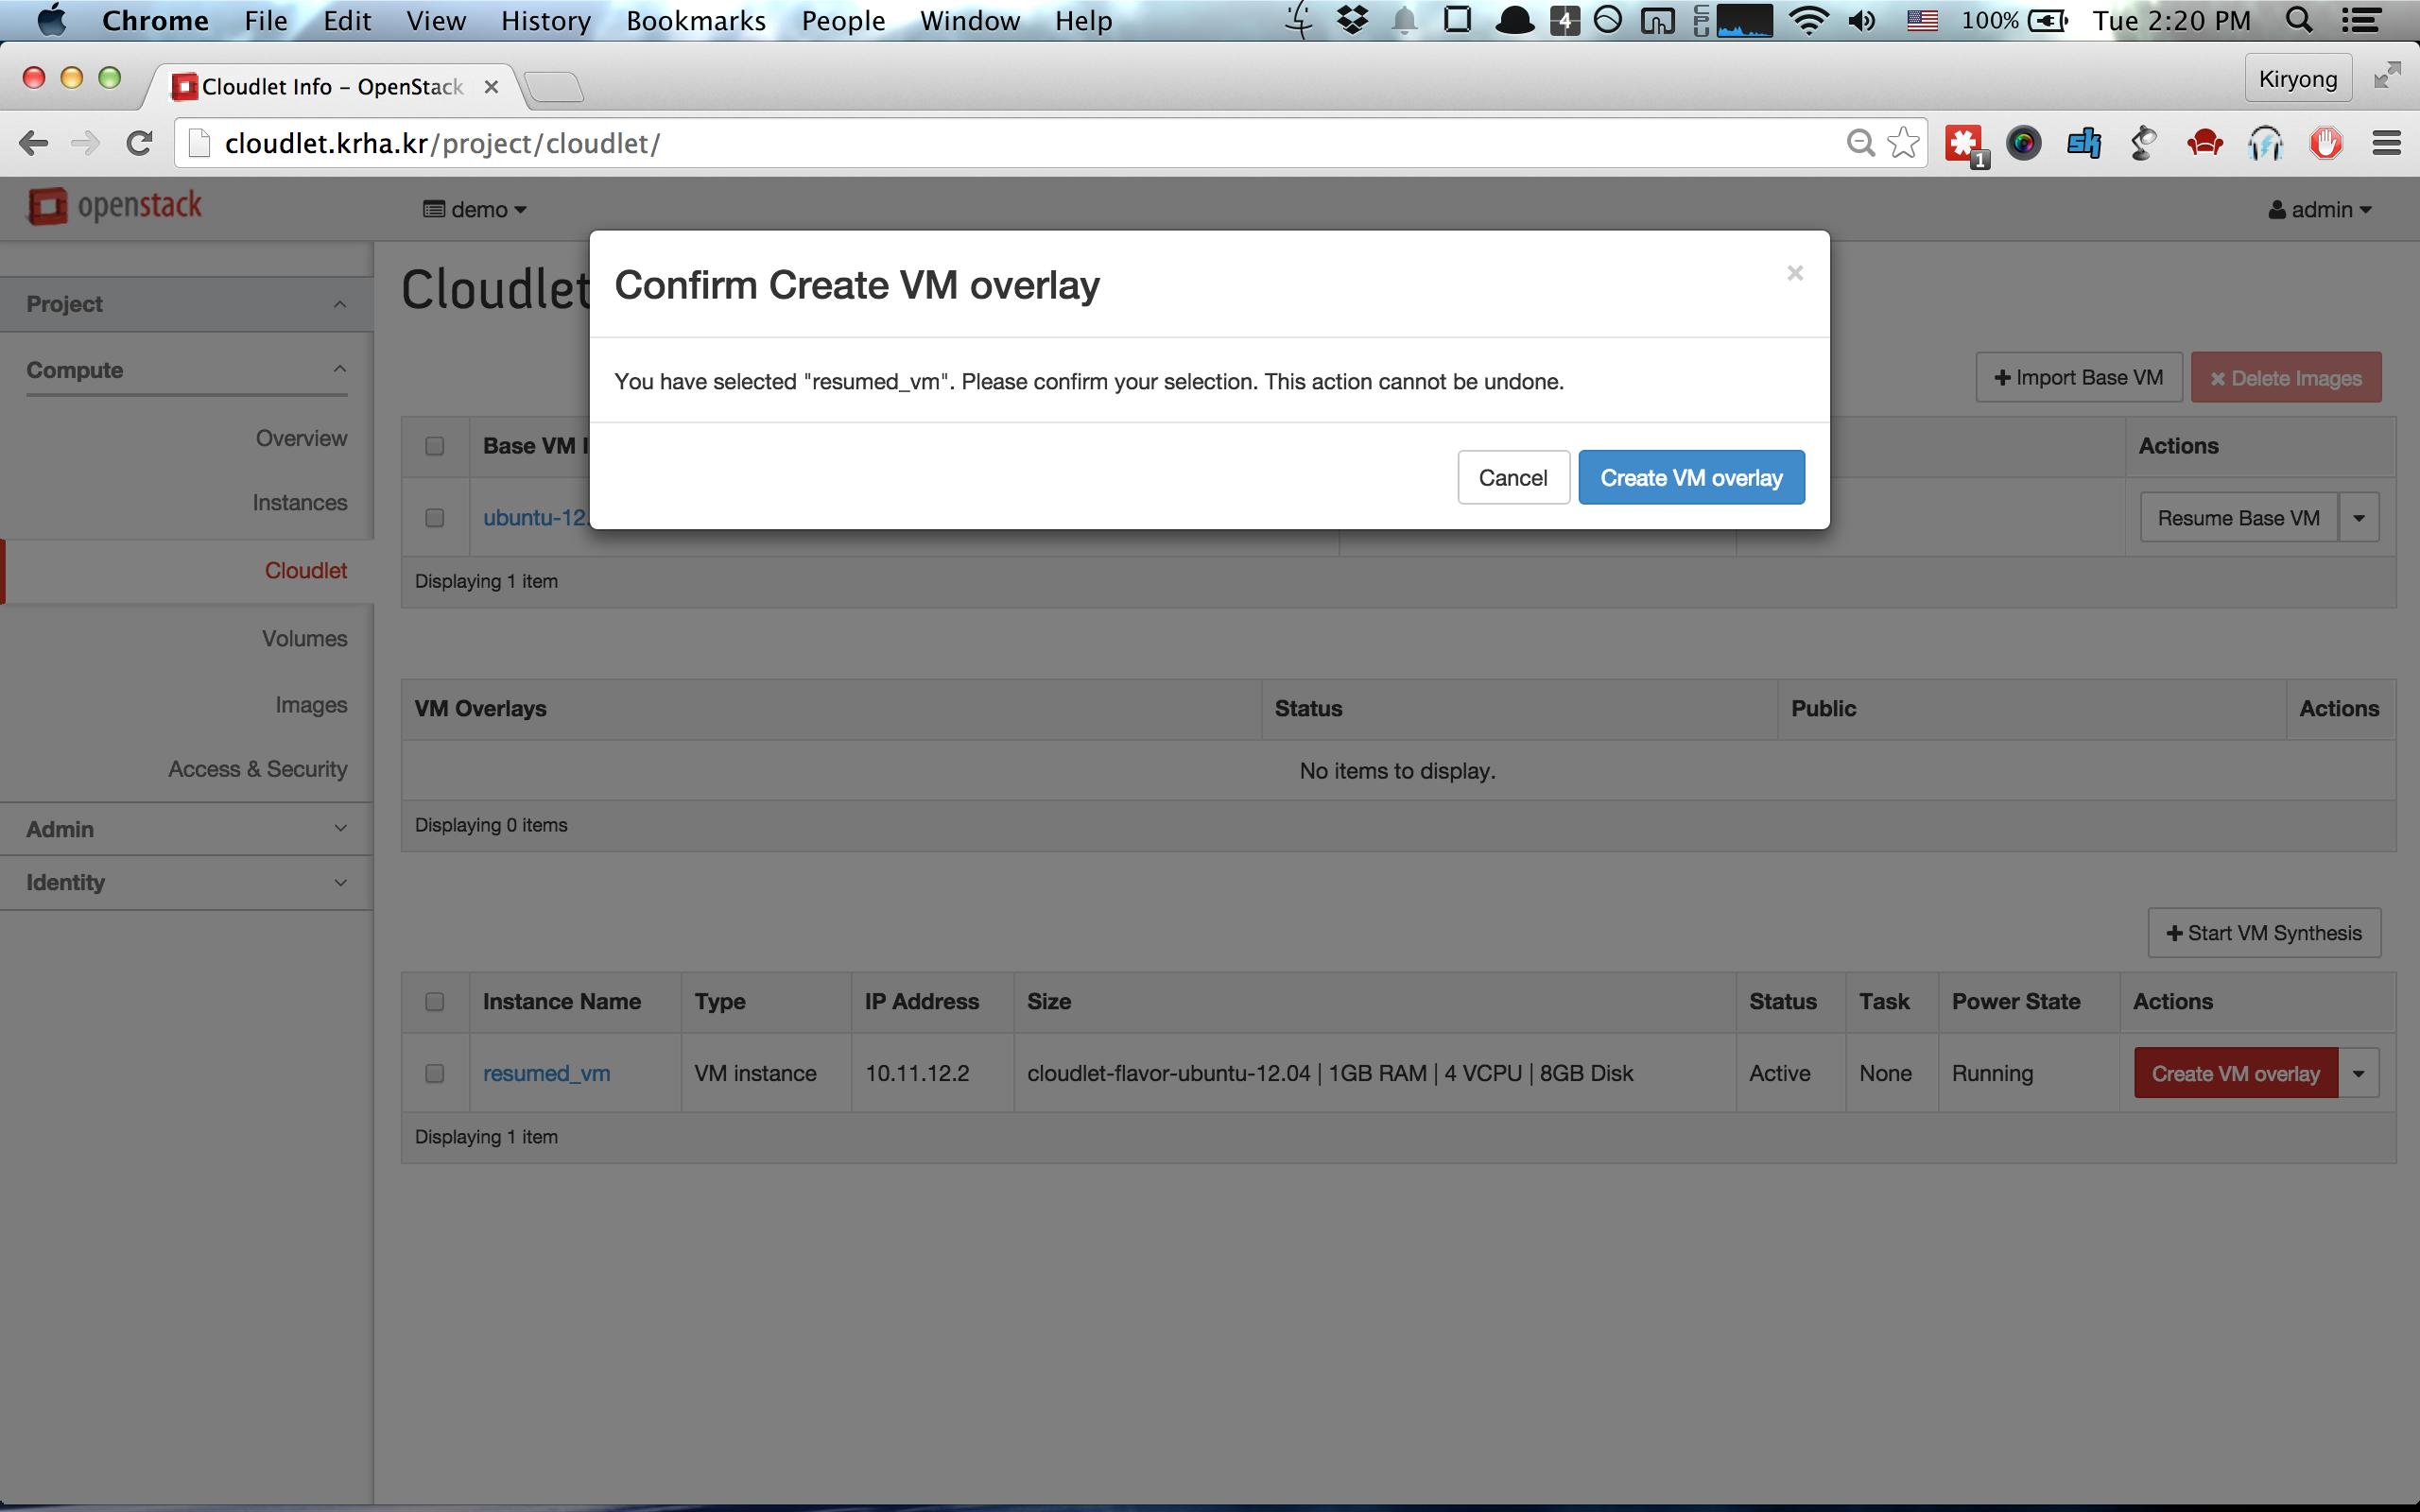 Creating VM overlay